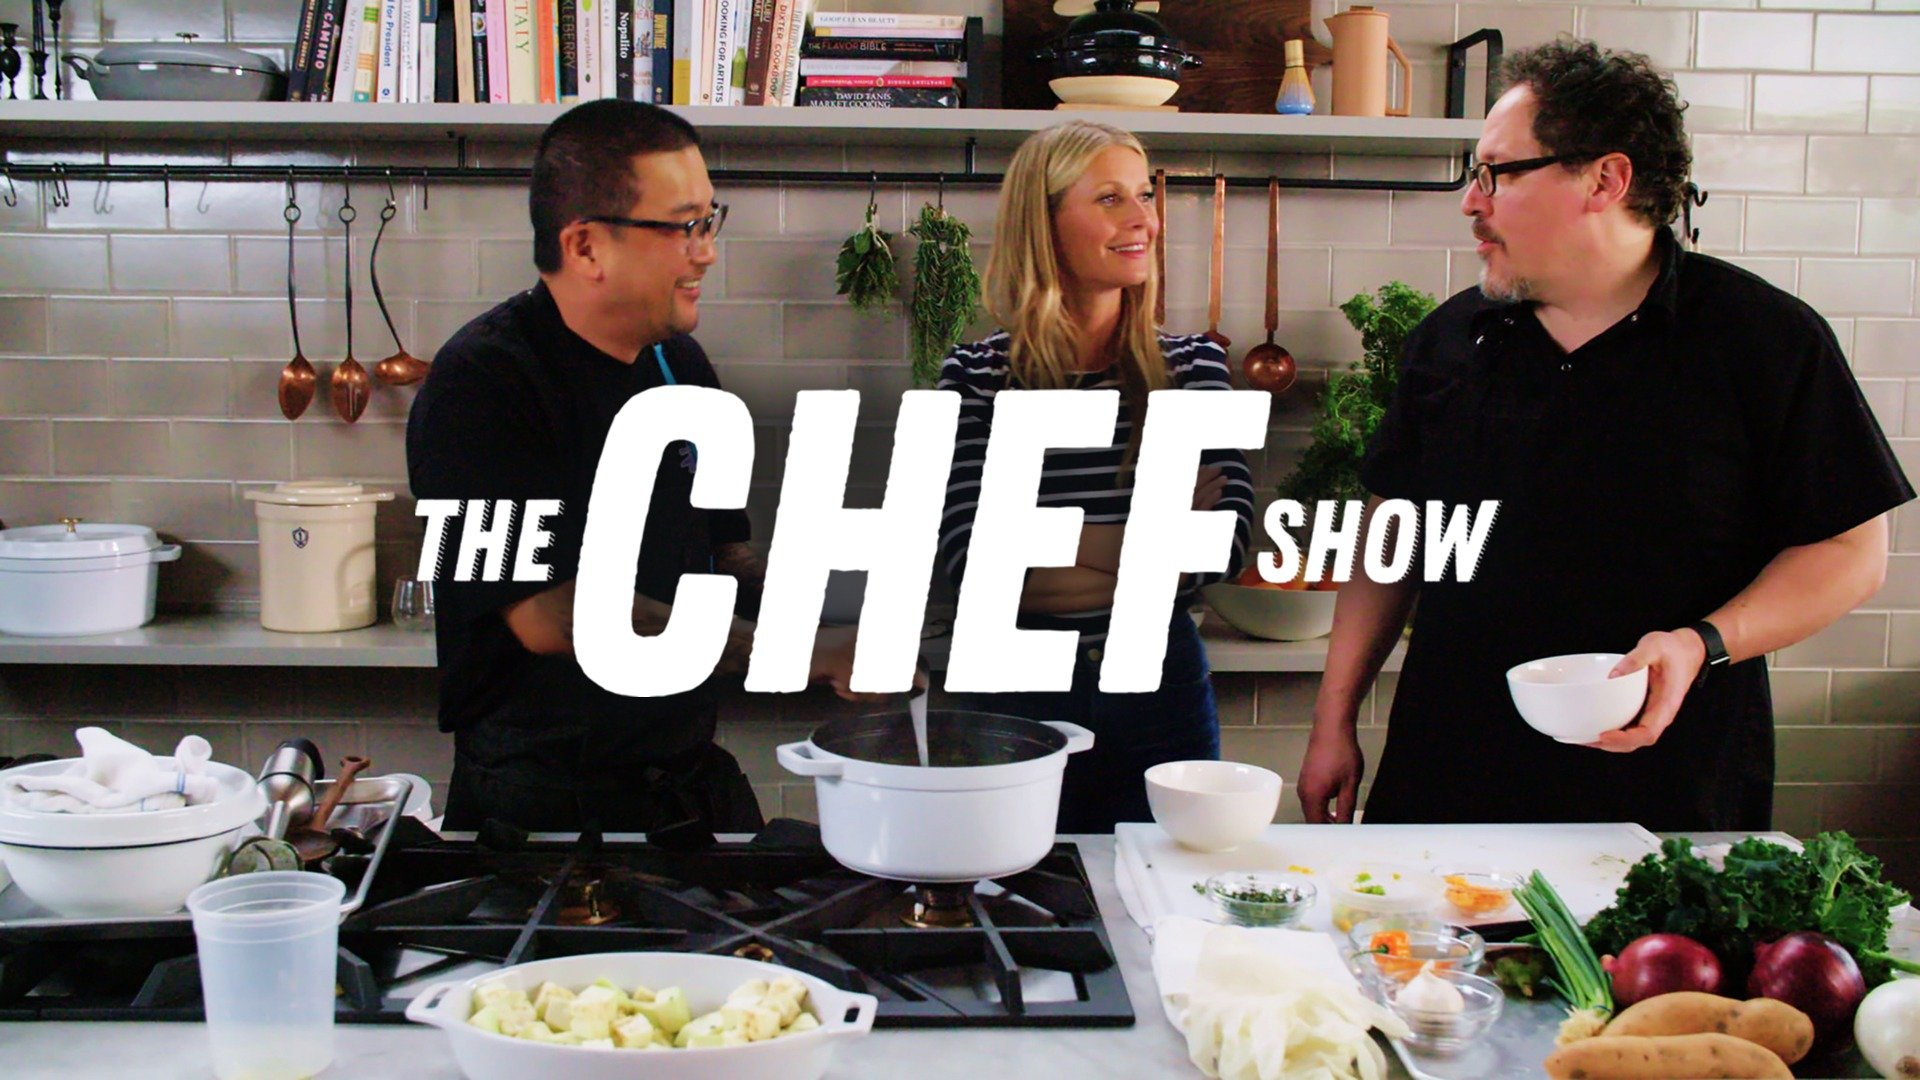 The Chef Show (Netflix)